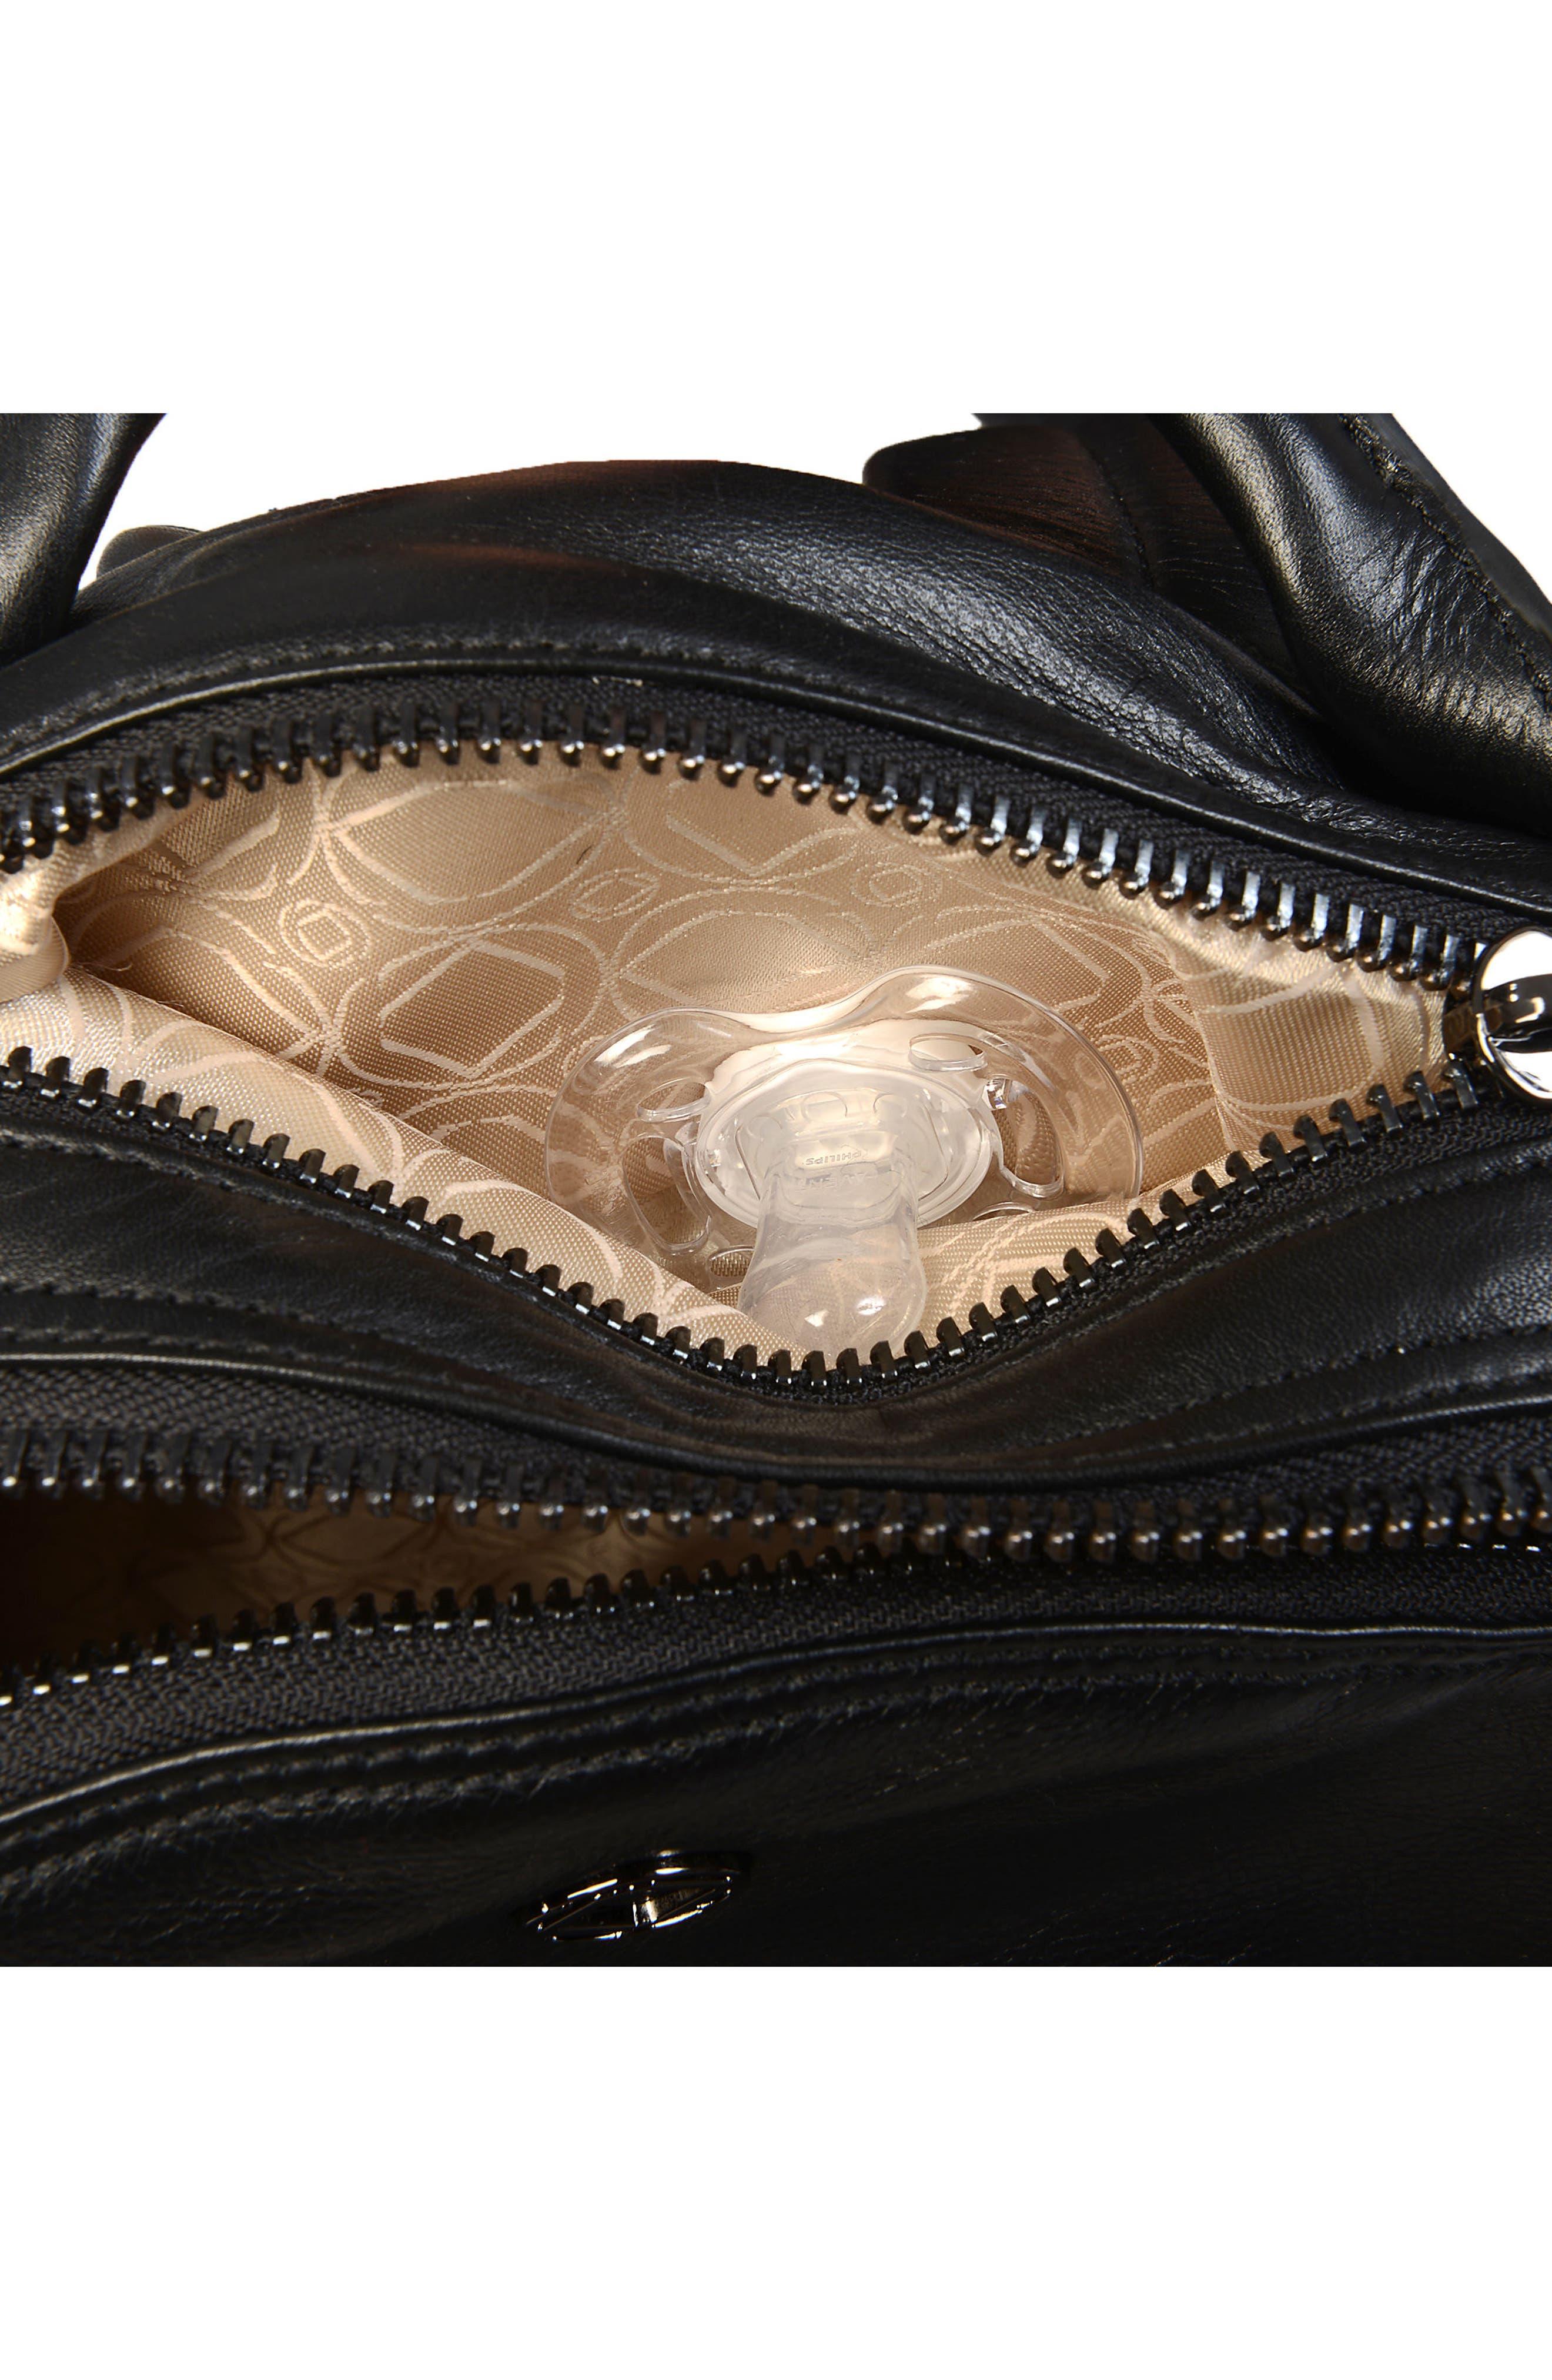 Joy XL Leather Backpack,                             Alternate thumbnail 11, color,                             Black